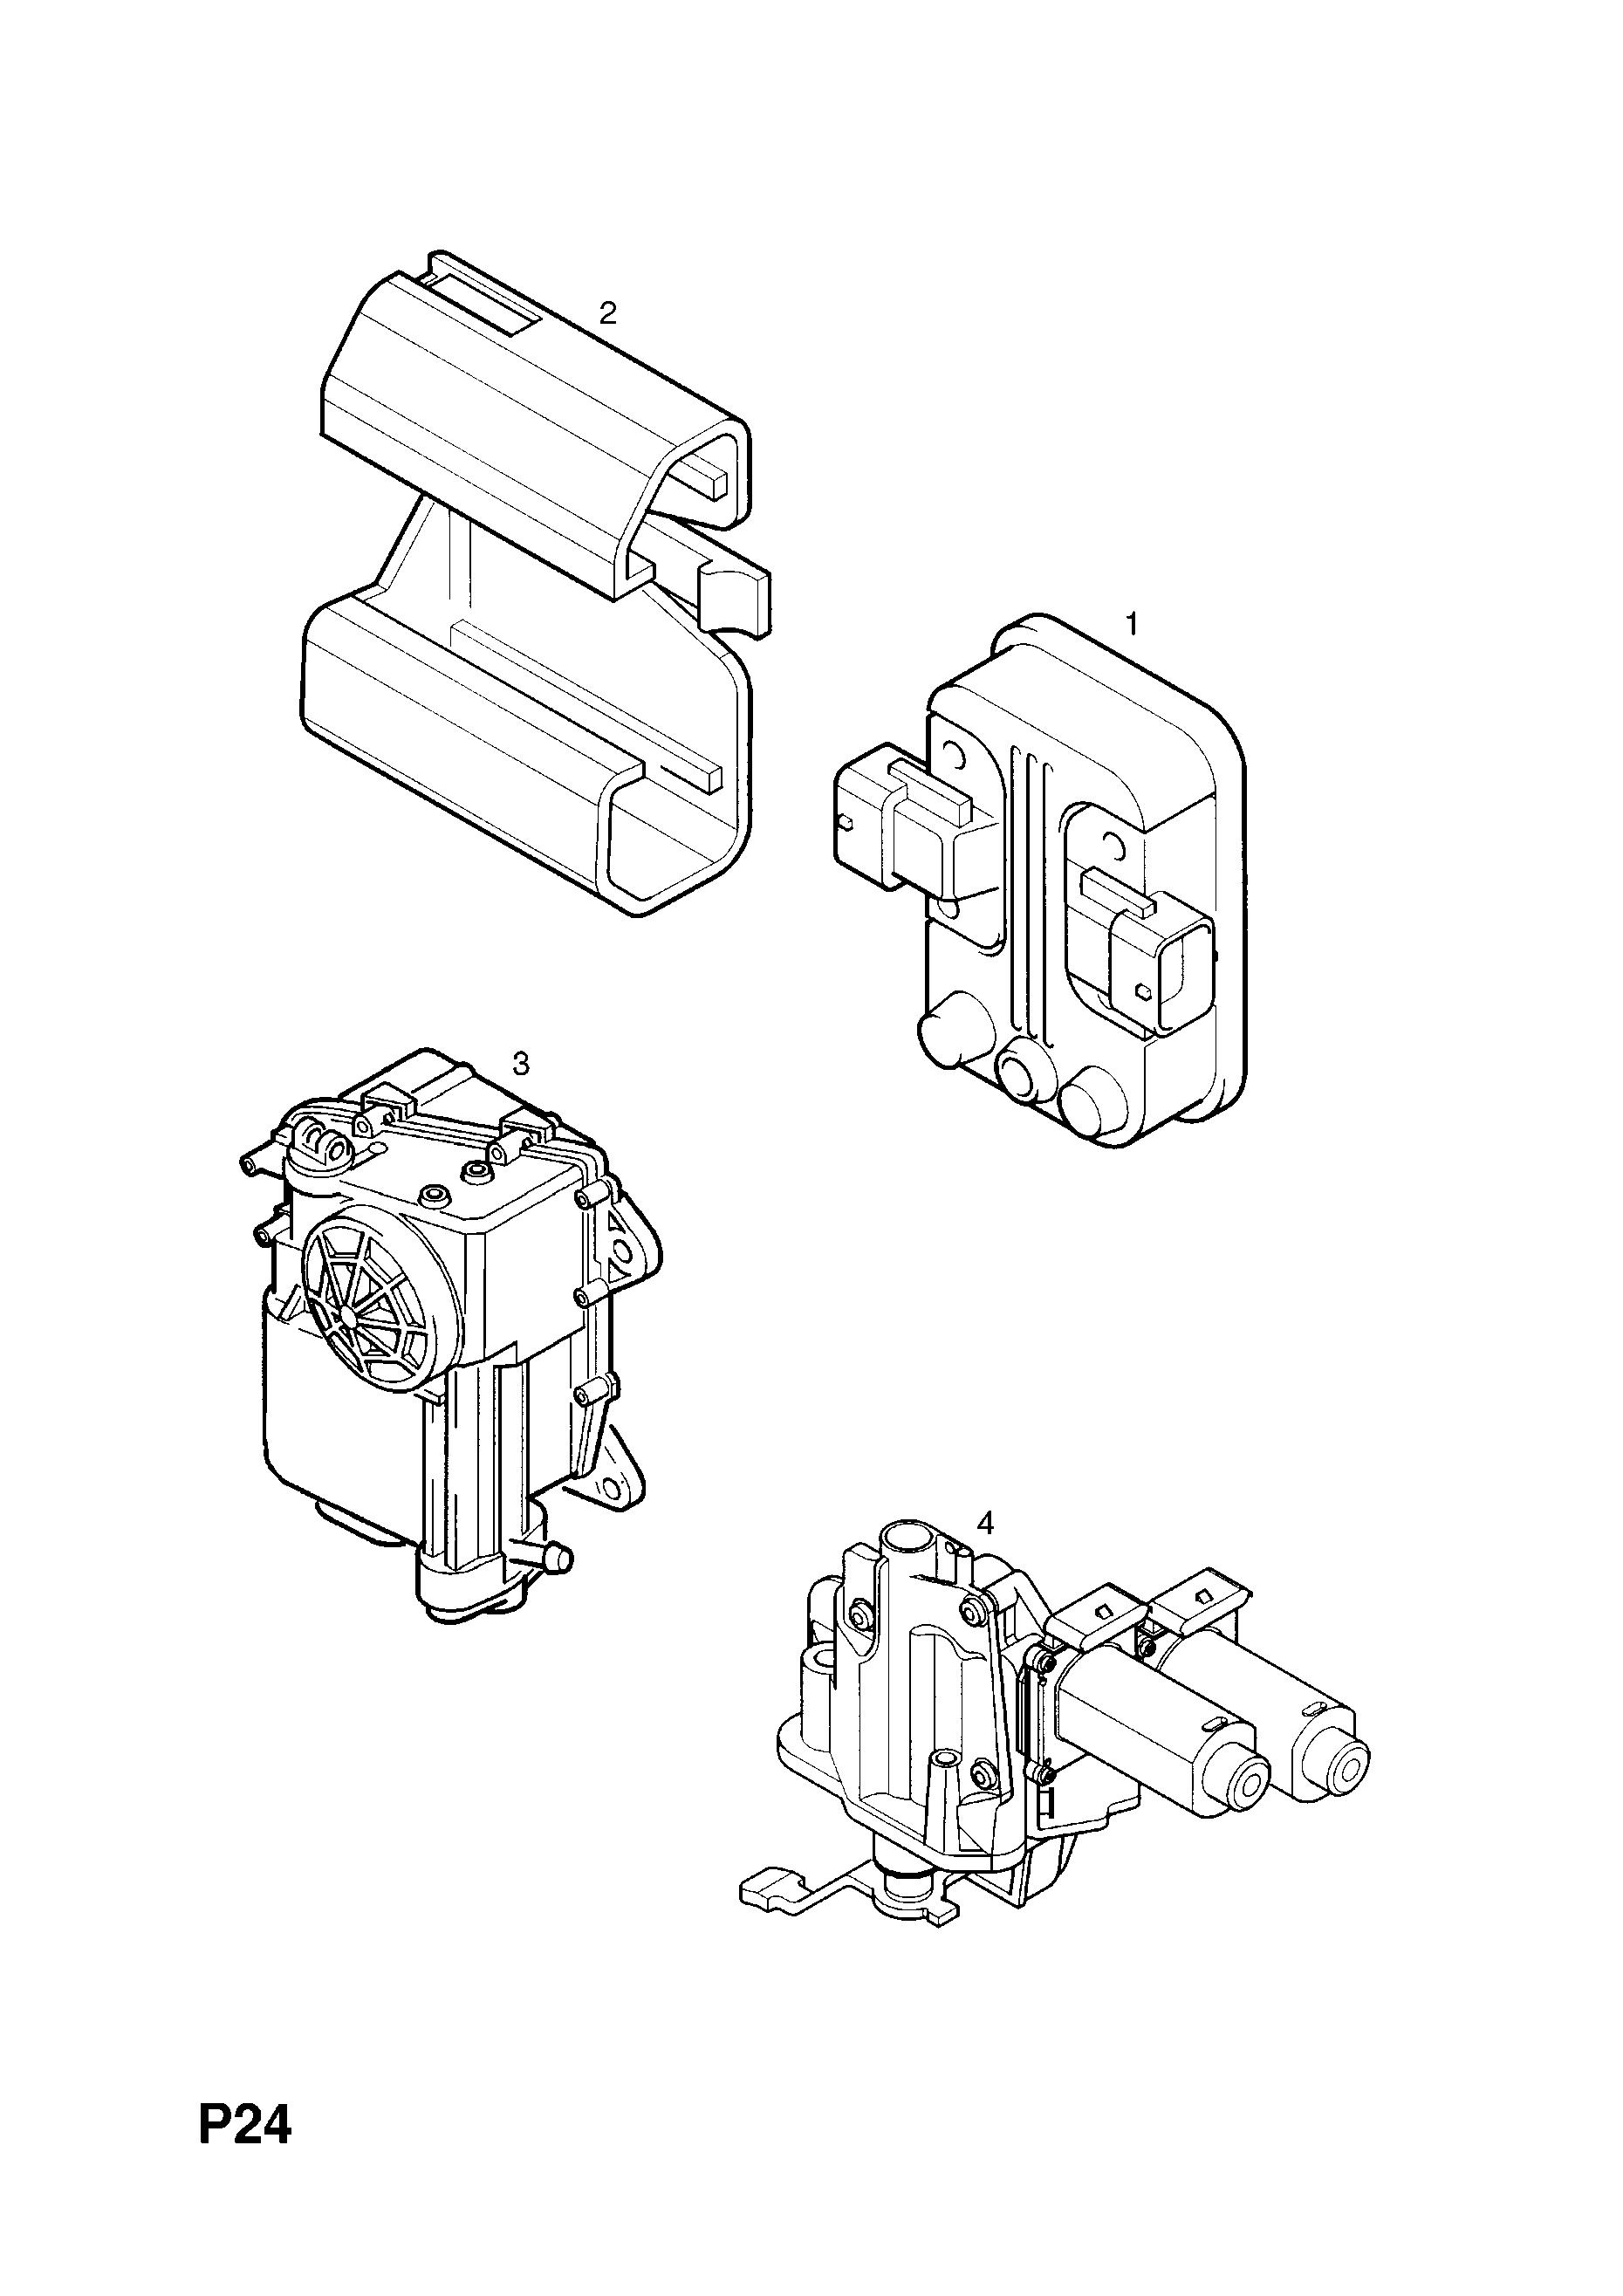 700r4 servo diagram wiring diagram database 4L80E Transmission Help Troubleshooting 4l60e transmission shift valve breakdown diagram wiring diagram 4l80e shift solenoid diagram 700r4 servo diagram